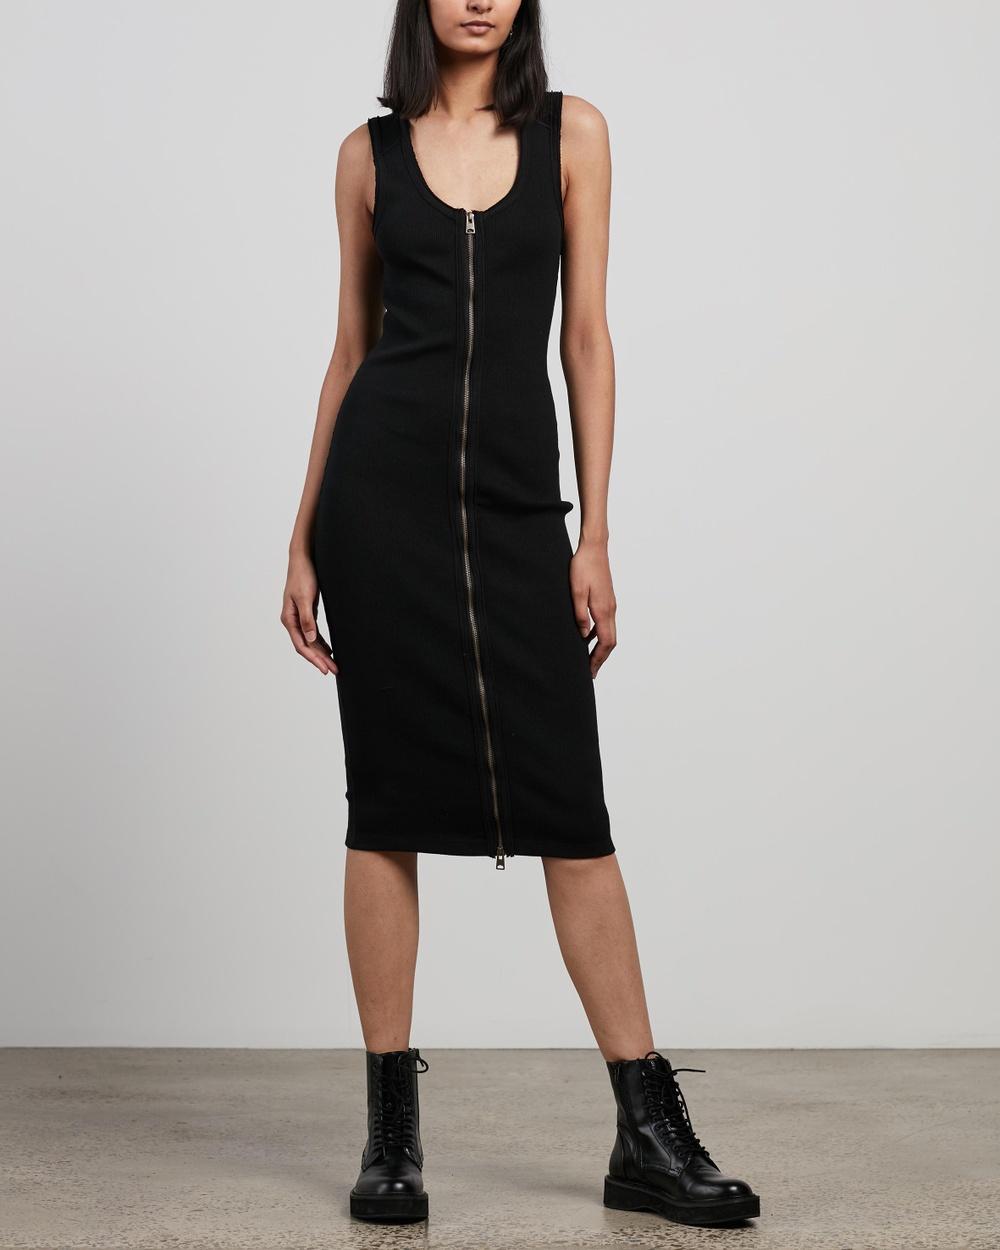 AllSaints Alicia Dress Bodycon Dresses Black